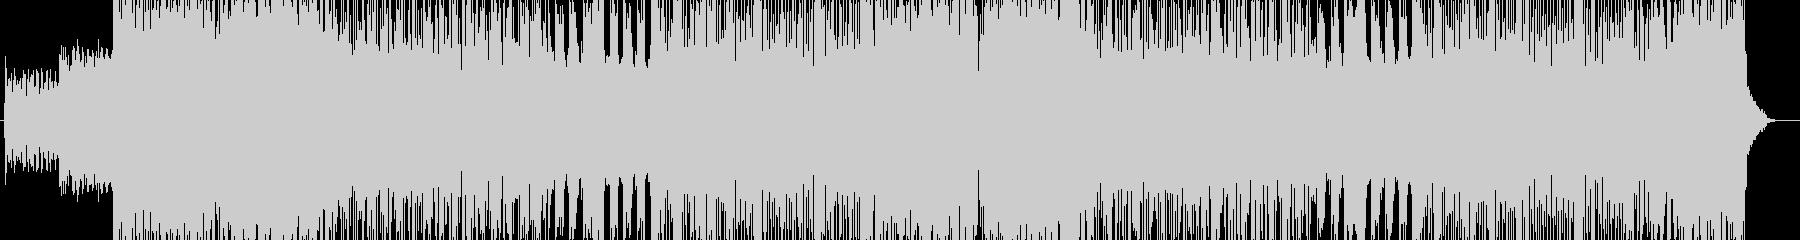 「HR/HM」「DARK」BGM151の未再生の波形